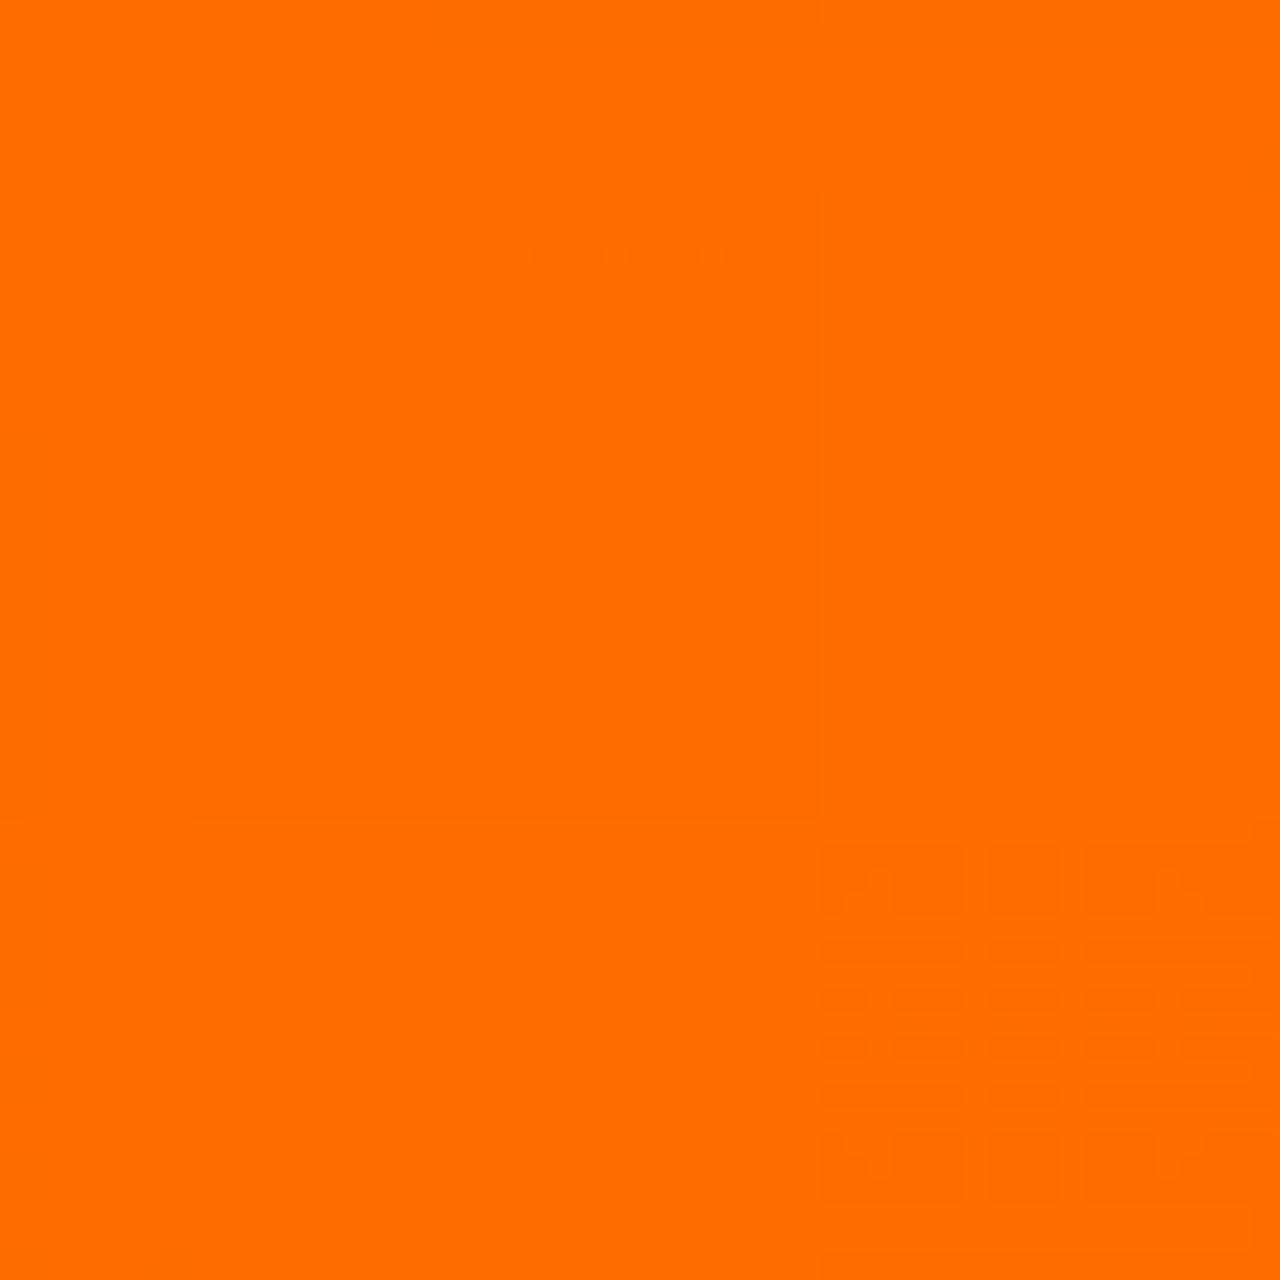 "#2002 Rosco Gels Roscolux Storaro Orange, 20x24"""